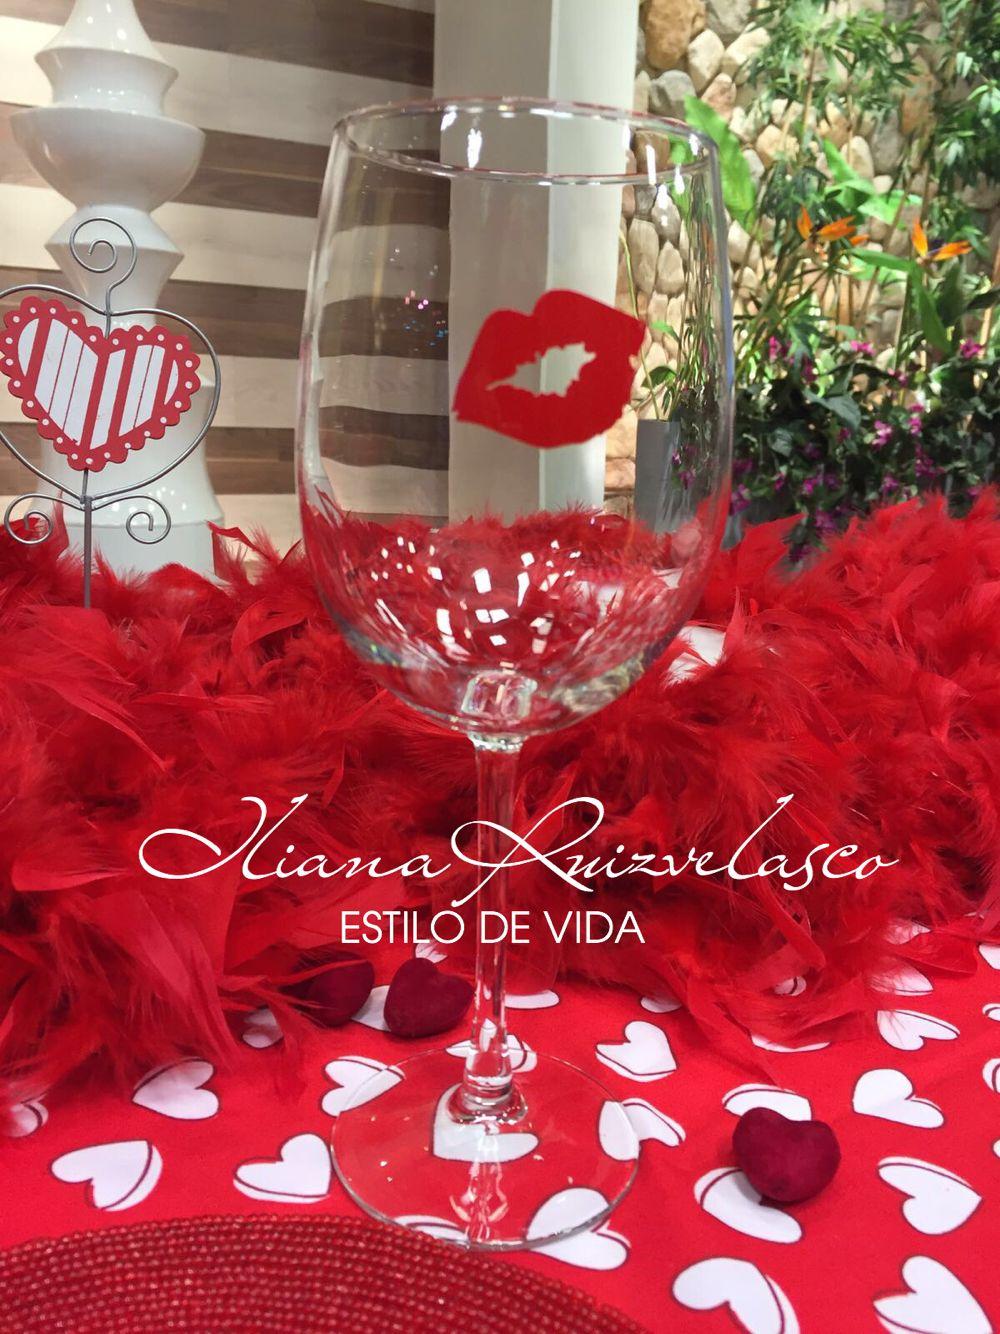 San Valentin Decoration Ideas Para Una Cena Romntica Copa Decorada Del 14 De Febrero D A